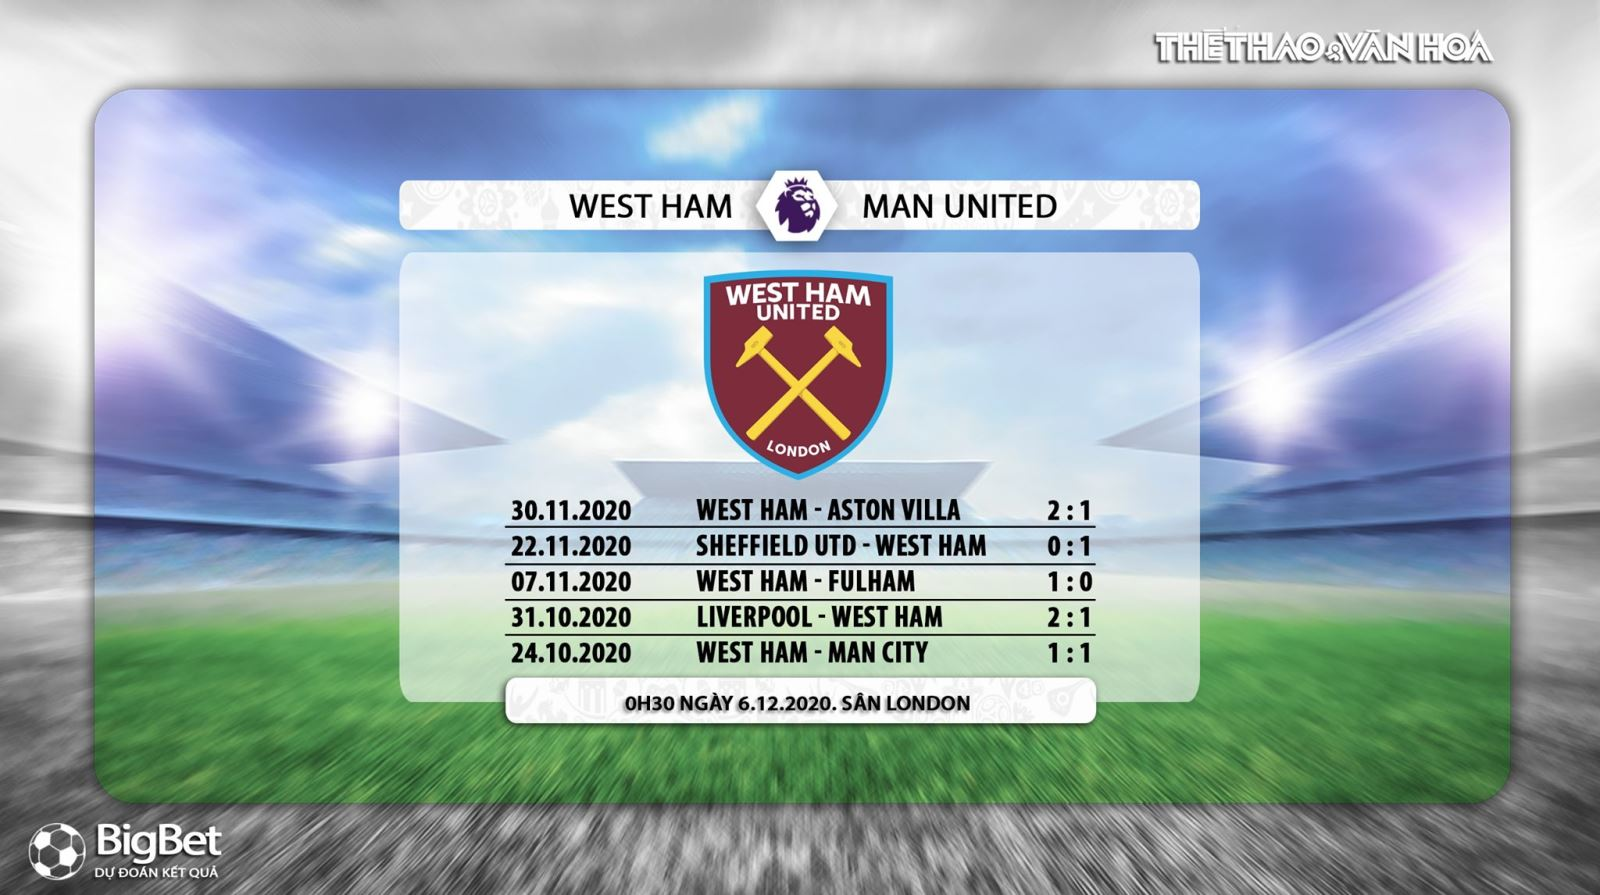 Trực tiếp West Ham vs MU. Truc tiep bong da. Link trực tiếp Ngoại hạng Anh